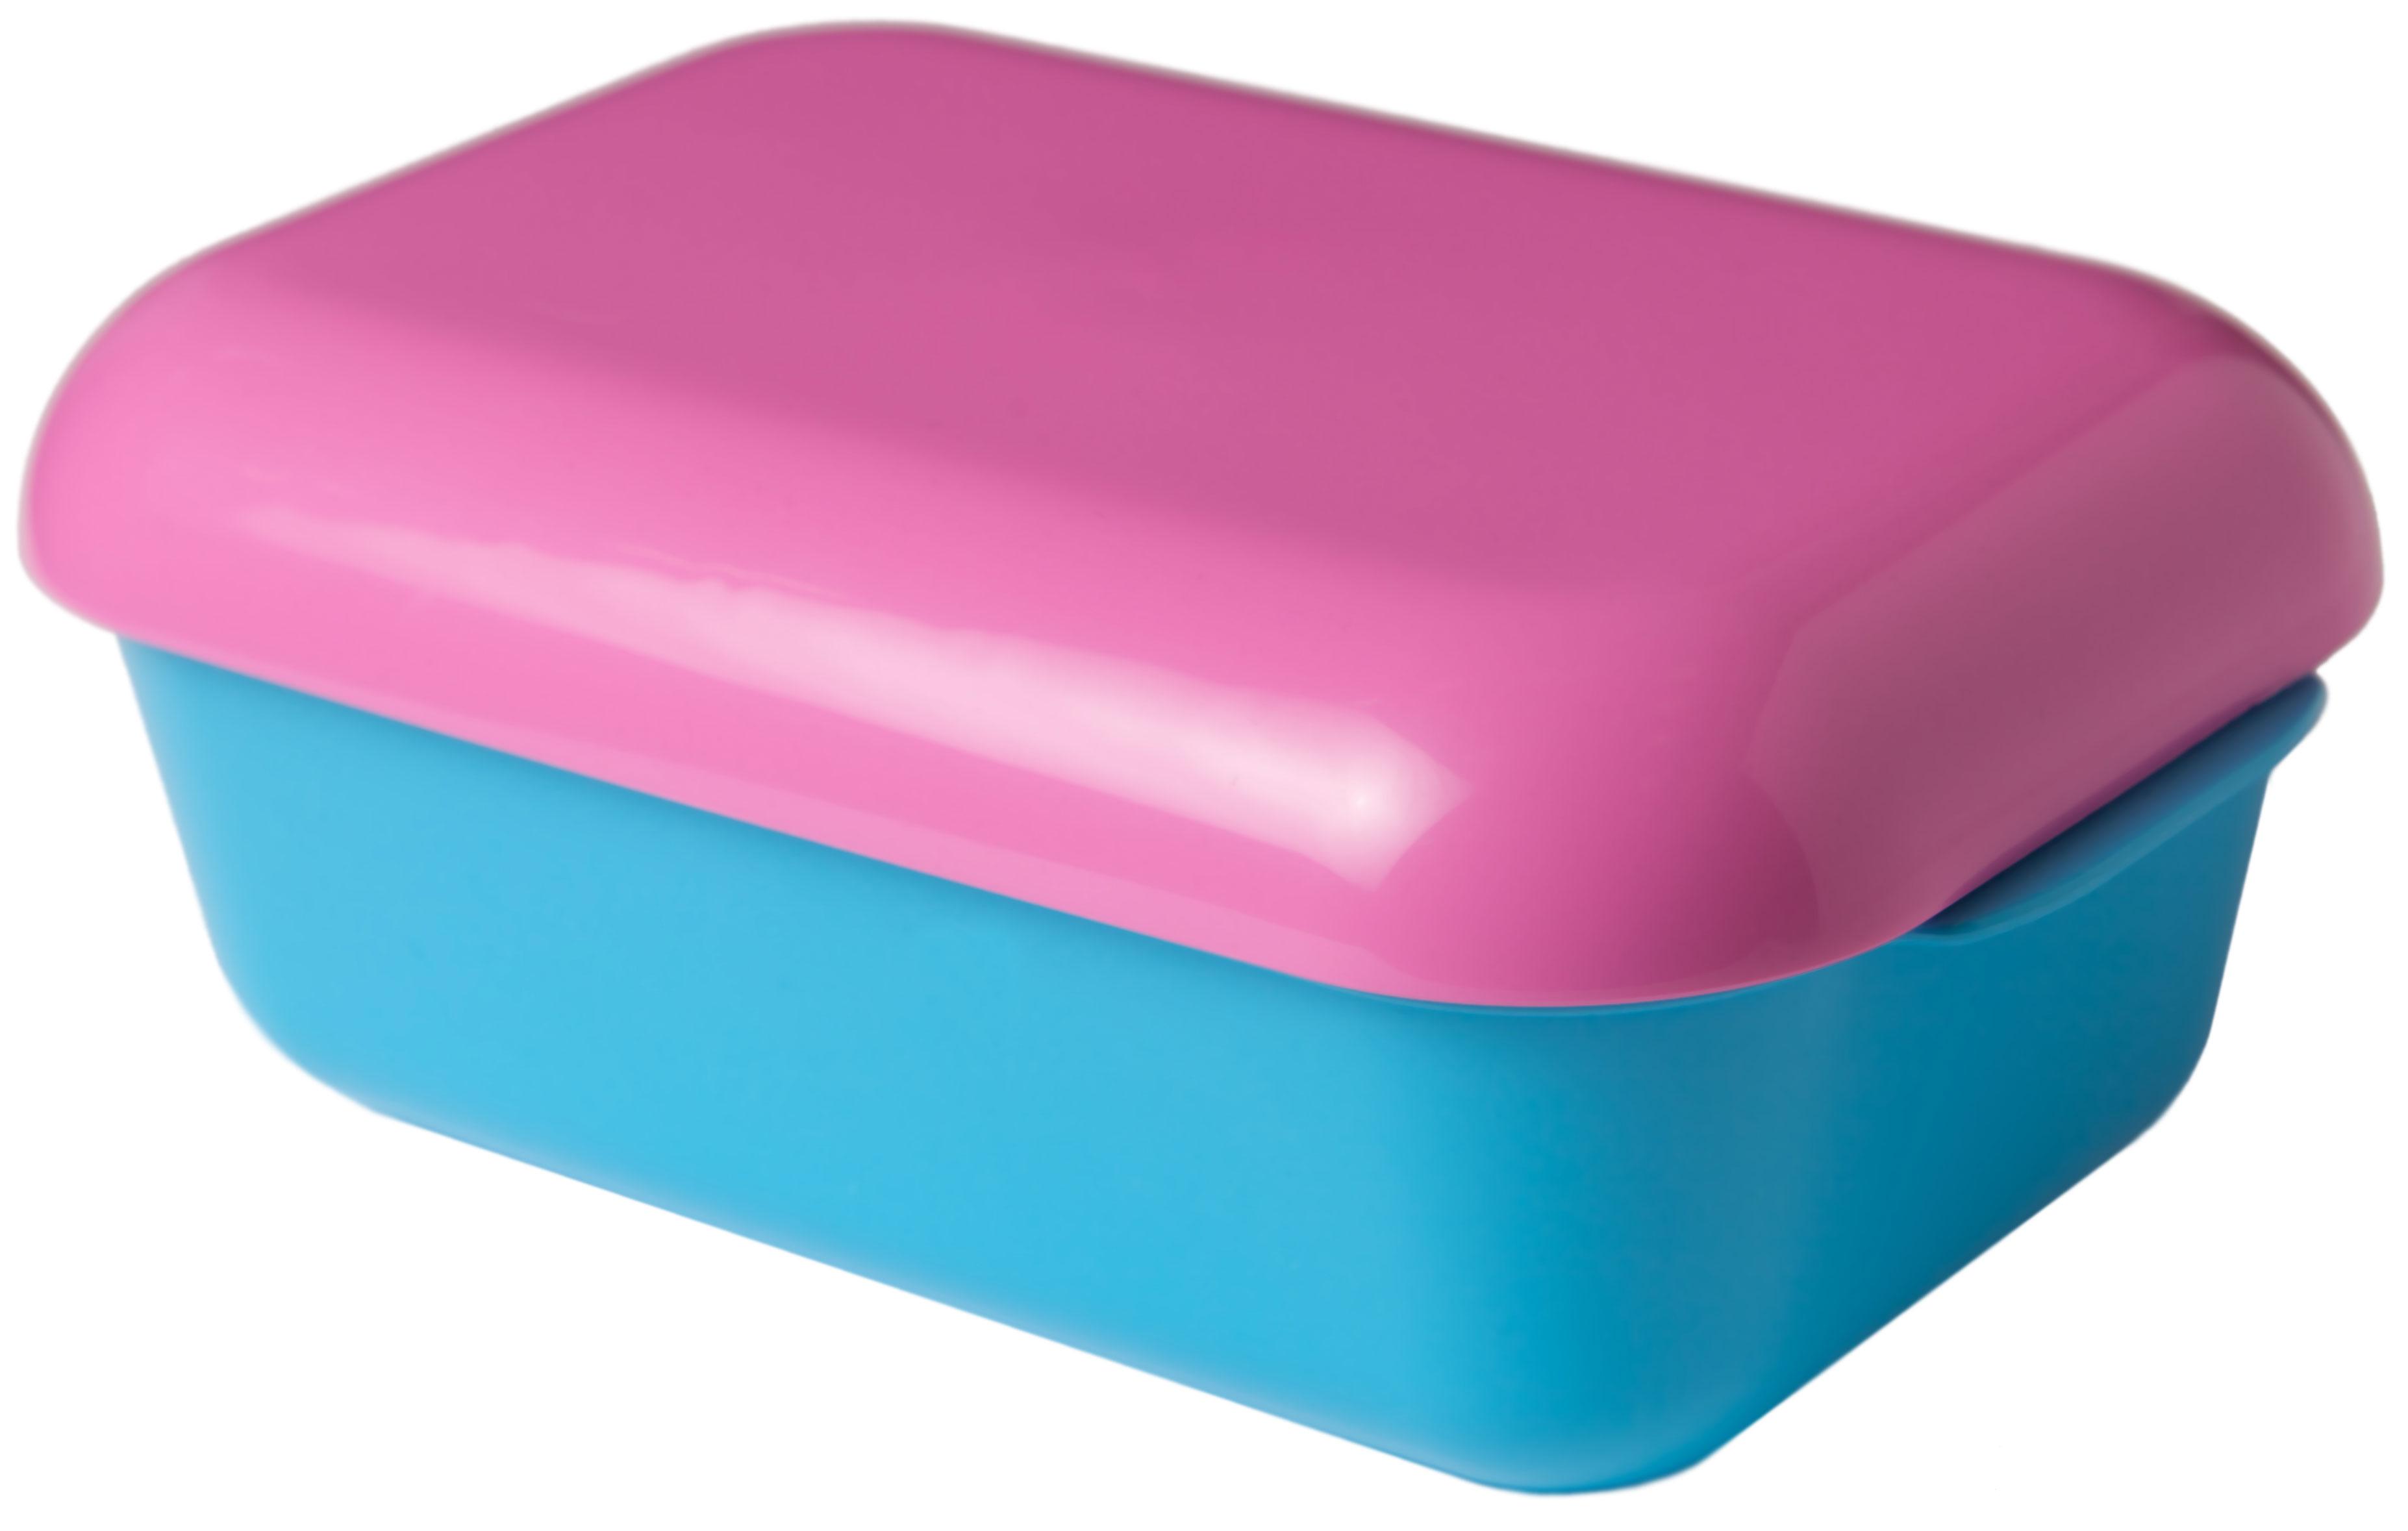 Frozzypack Kylmatlåda Summer Edition Blue Pink